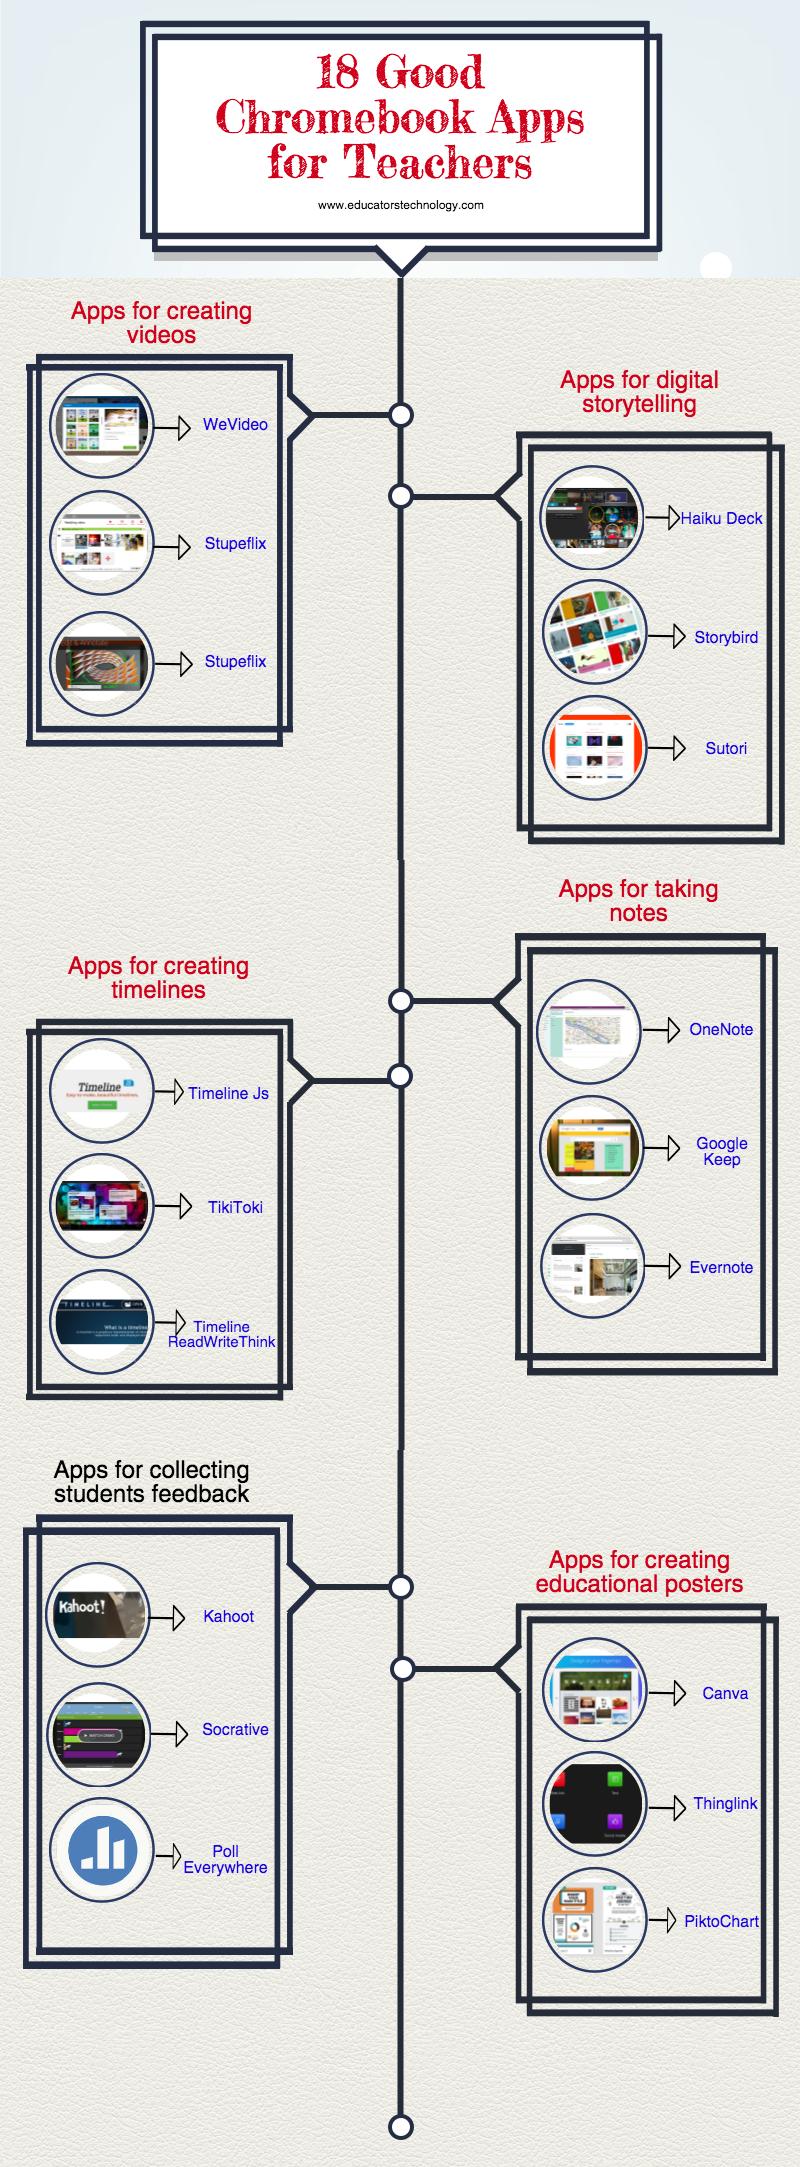 18 Good Chromebook Apps for Teachers